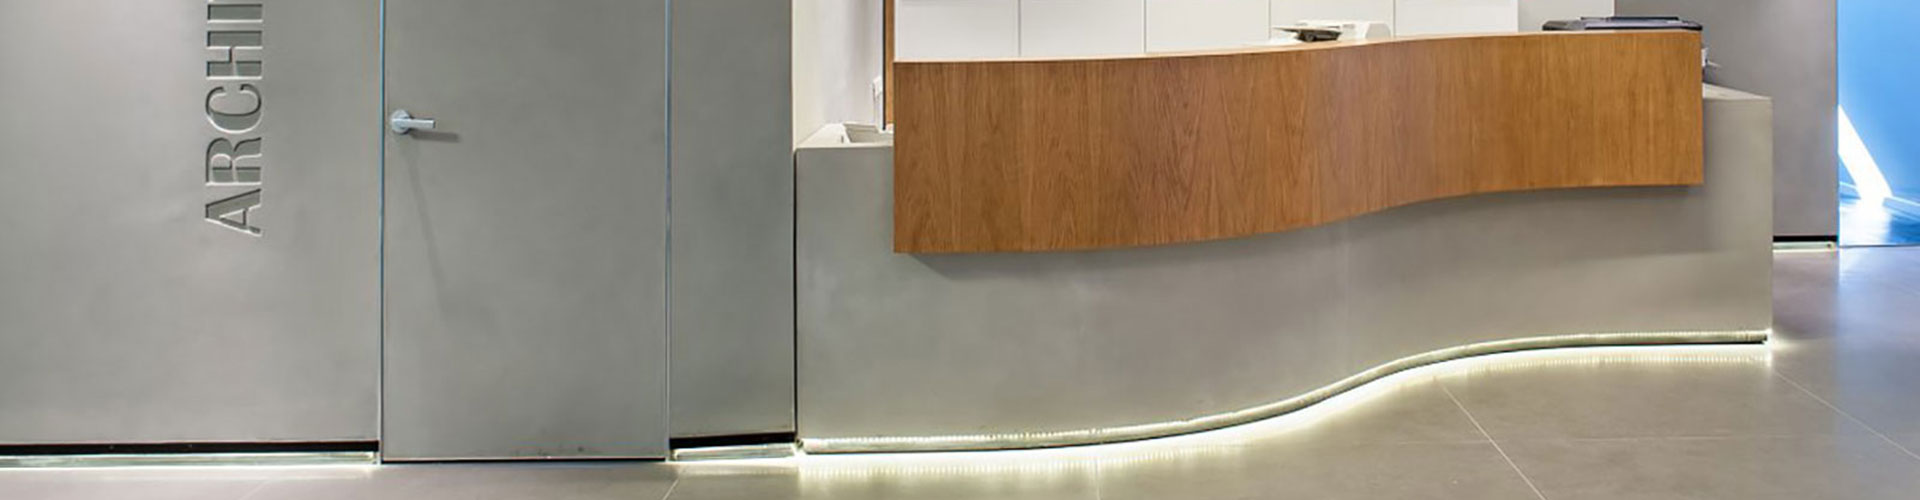 Microtopping-Concrete-Office-Design-_-By-BETONADA-(B1)